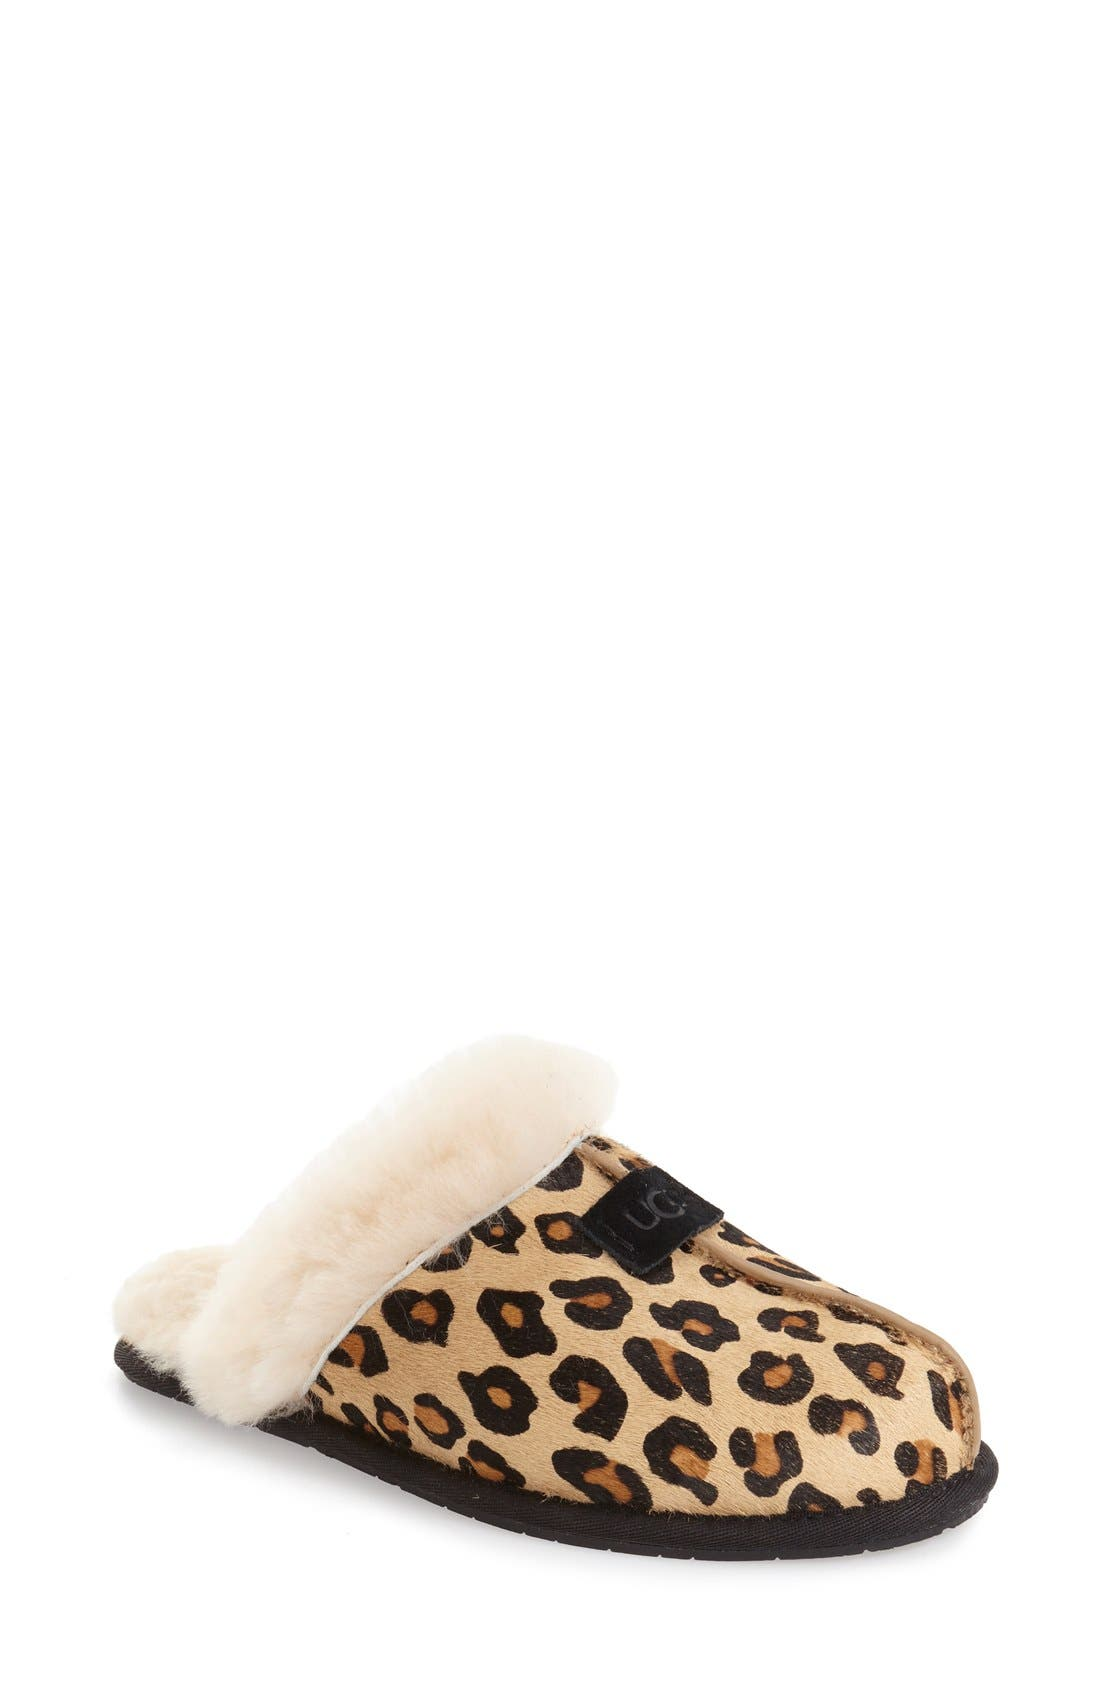 Scuffette II Leopard Spot Calf Hair Genuine Shearling Cuff Slipper,                             Main thumbnail 1, color,                             Leopard Calf Hair